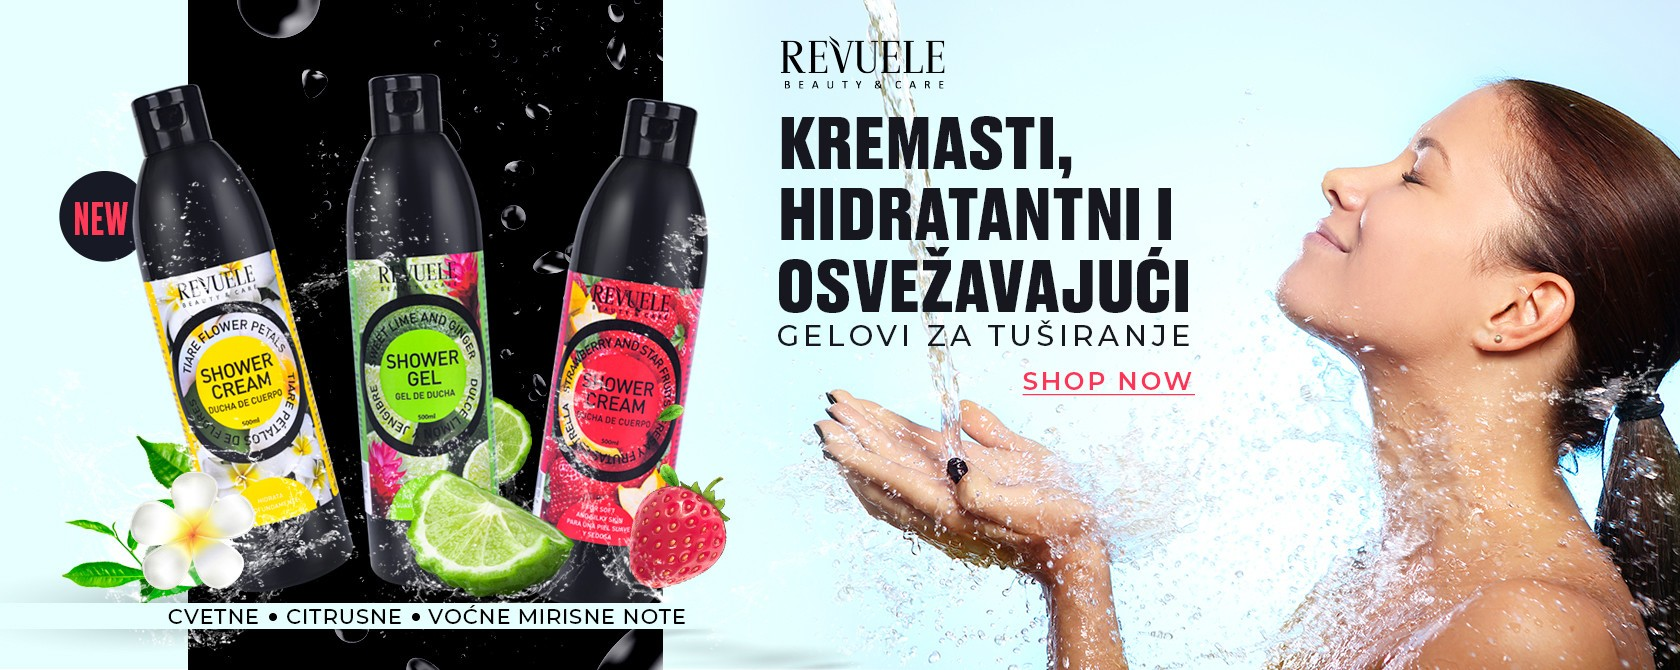 Ruvele shower gel